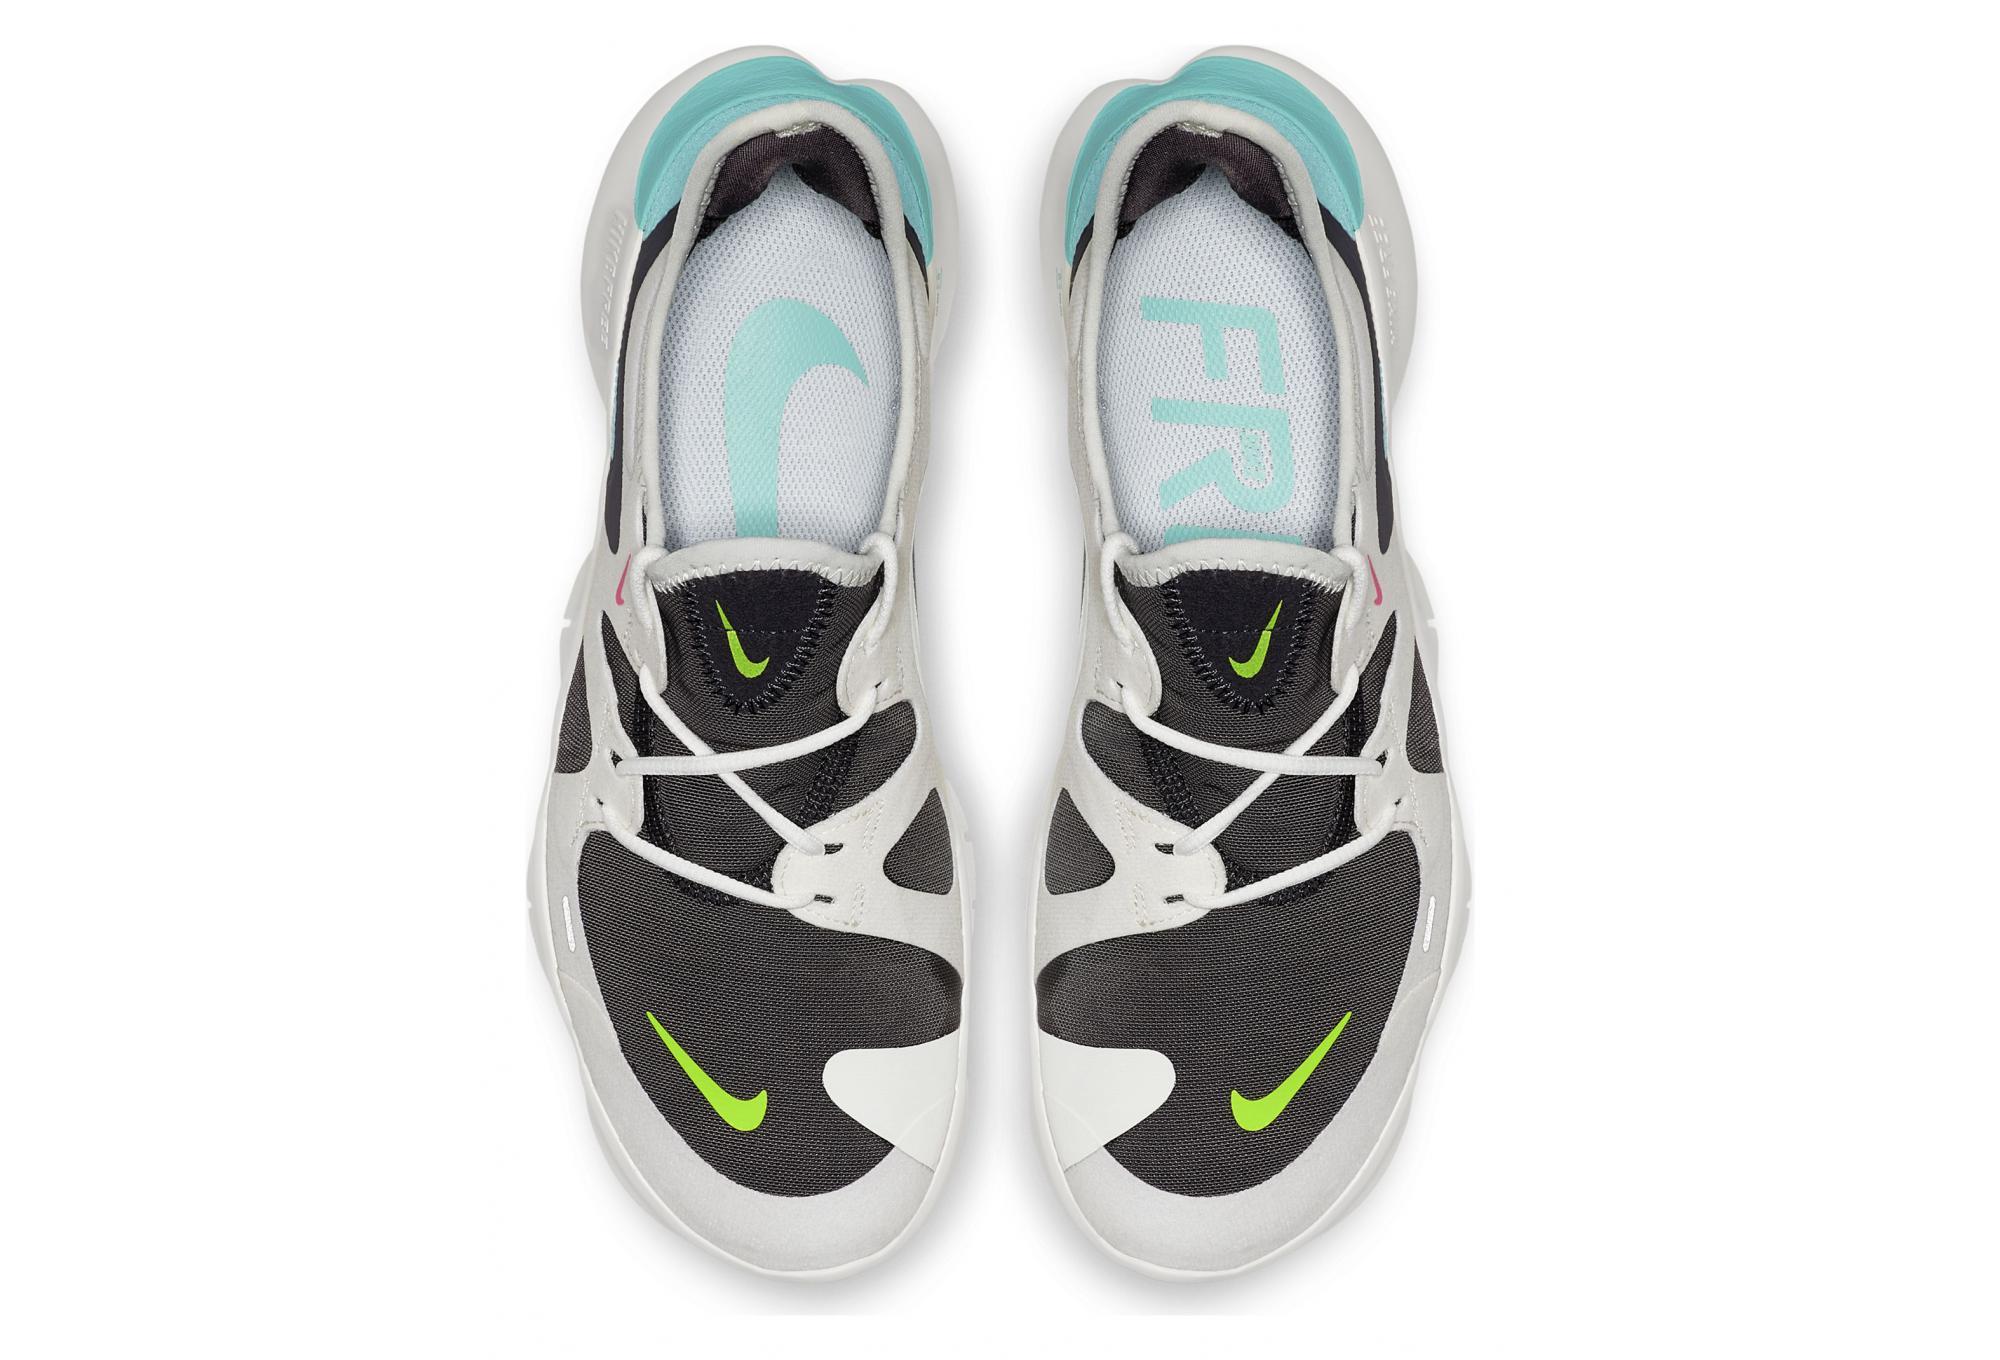 Nike Free RN 5.0 White Multi color Women